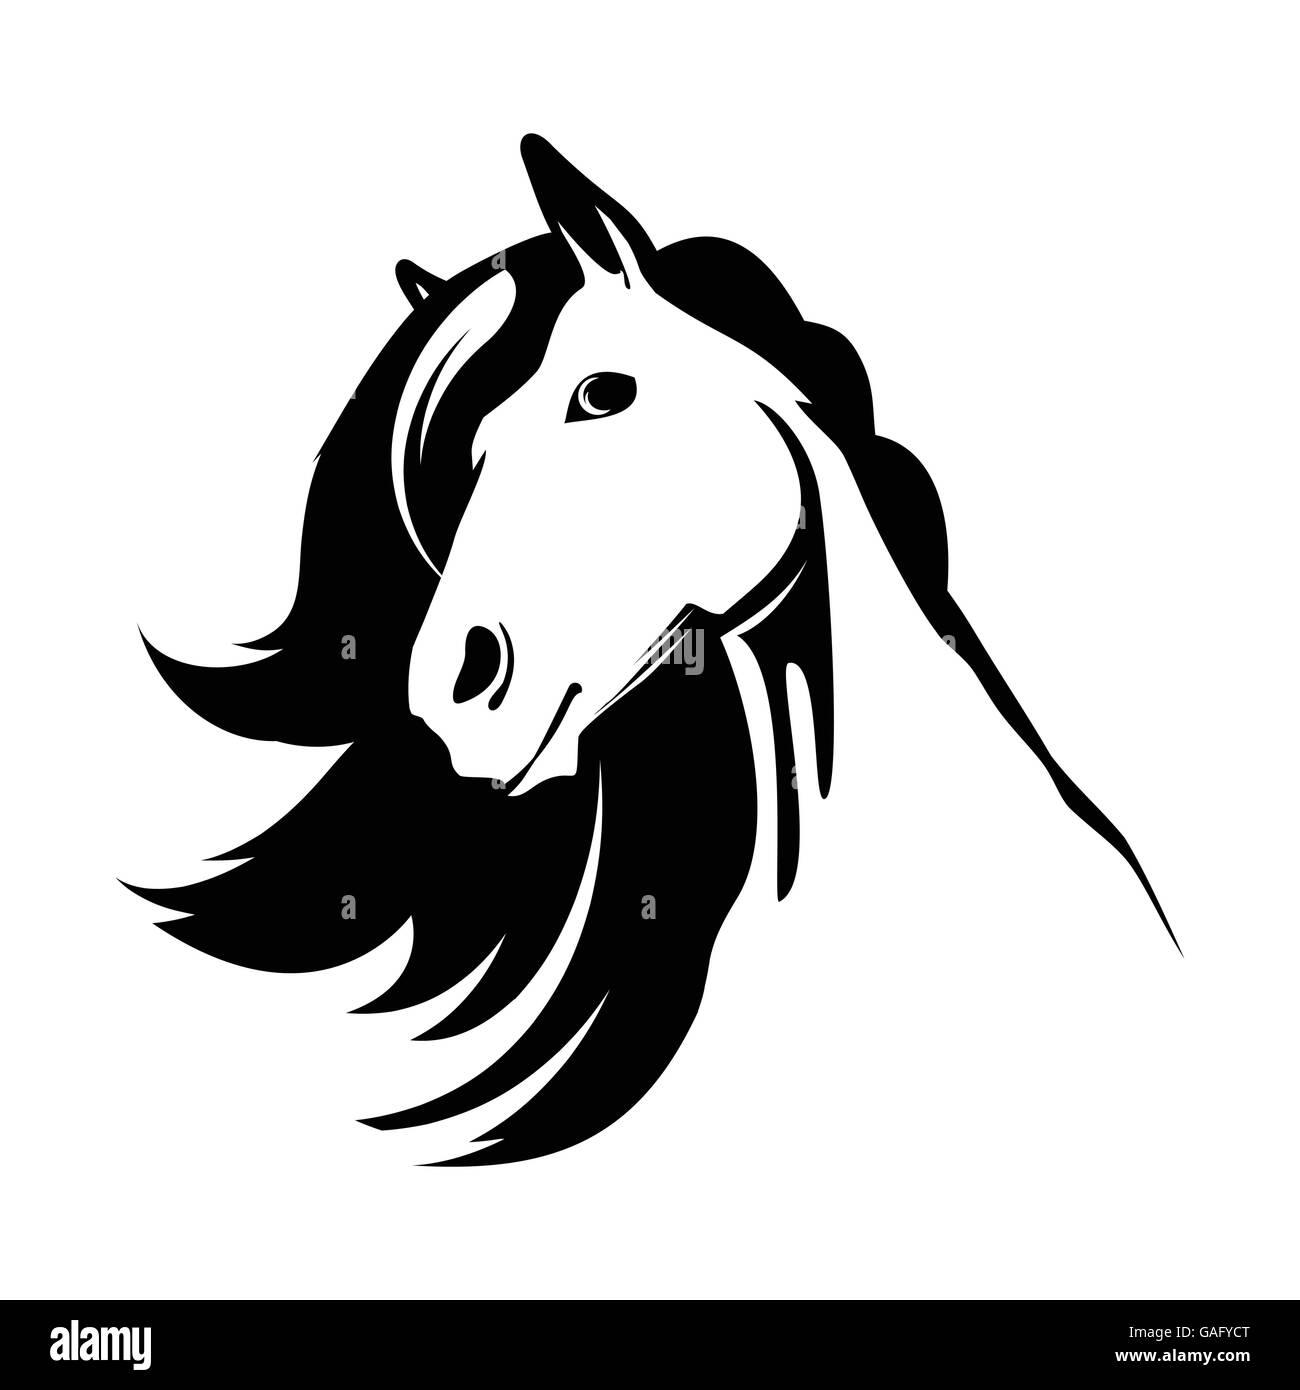 Horse Logo Black And White Stock Photos Images Alamy